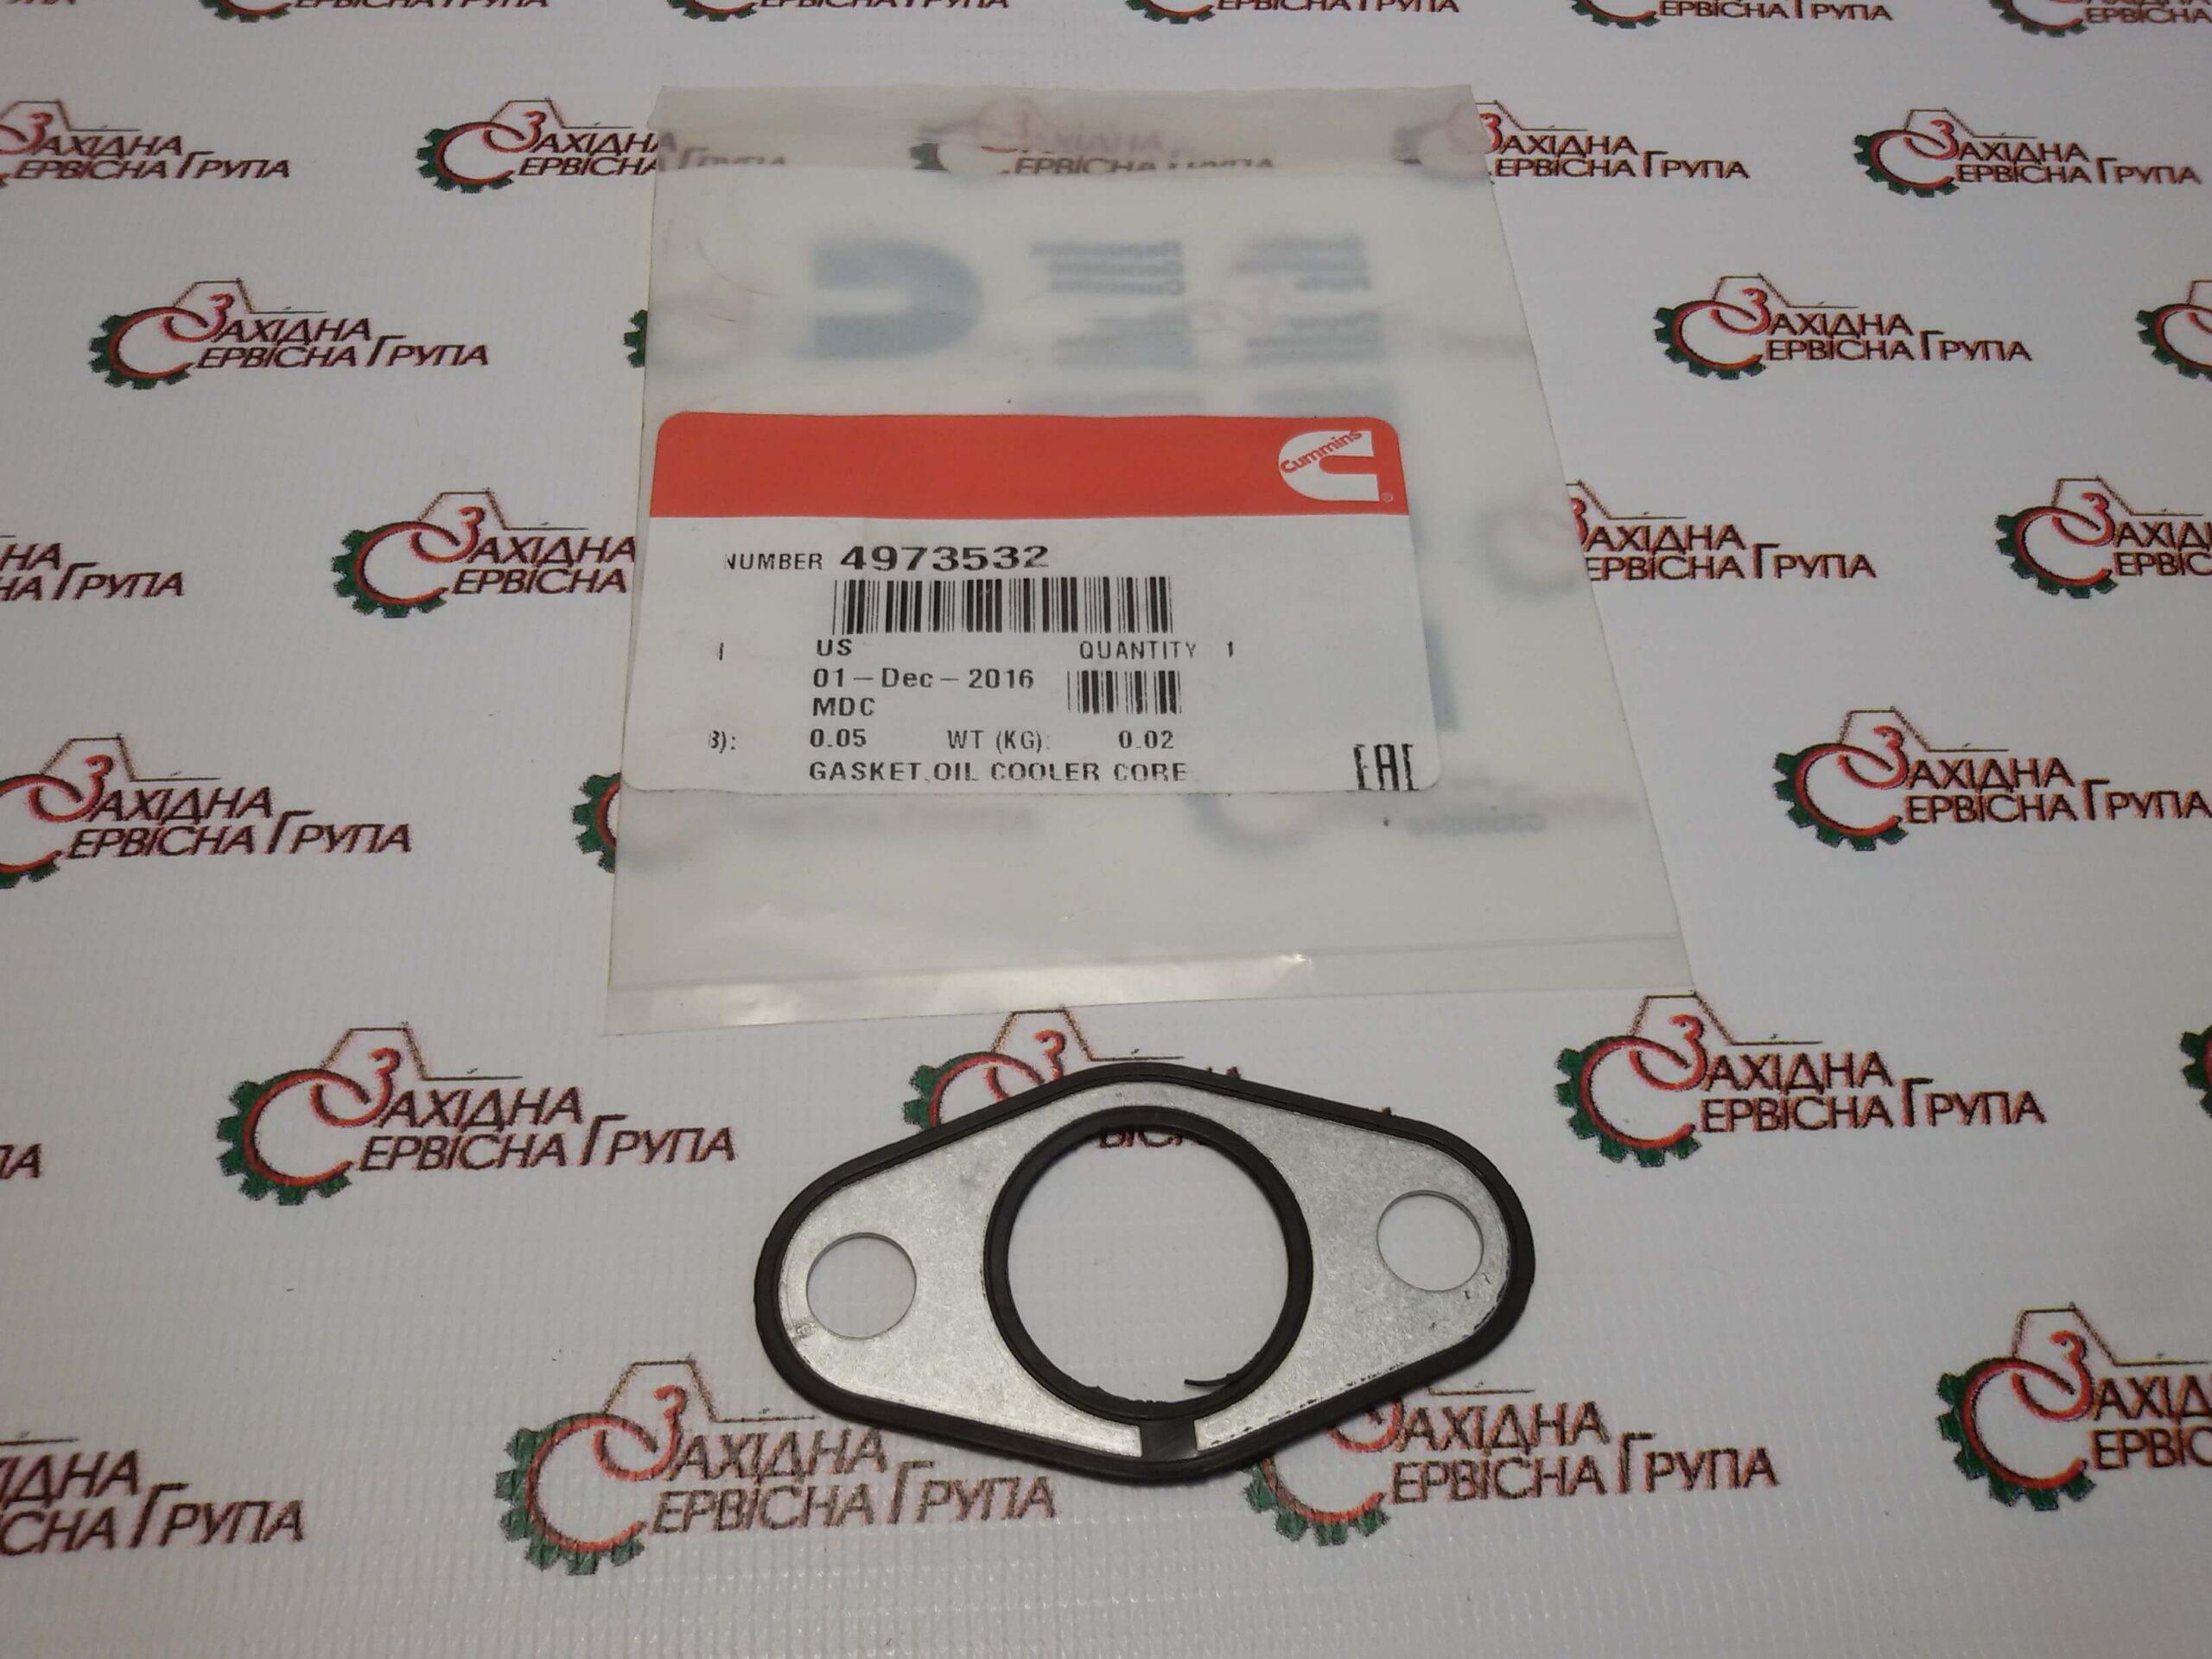 Прокладка маслоохладителя Cummins ISX15, QSX15, 4973532, 4101869, 4059387, 3680714.